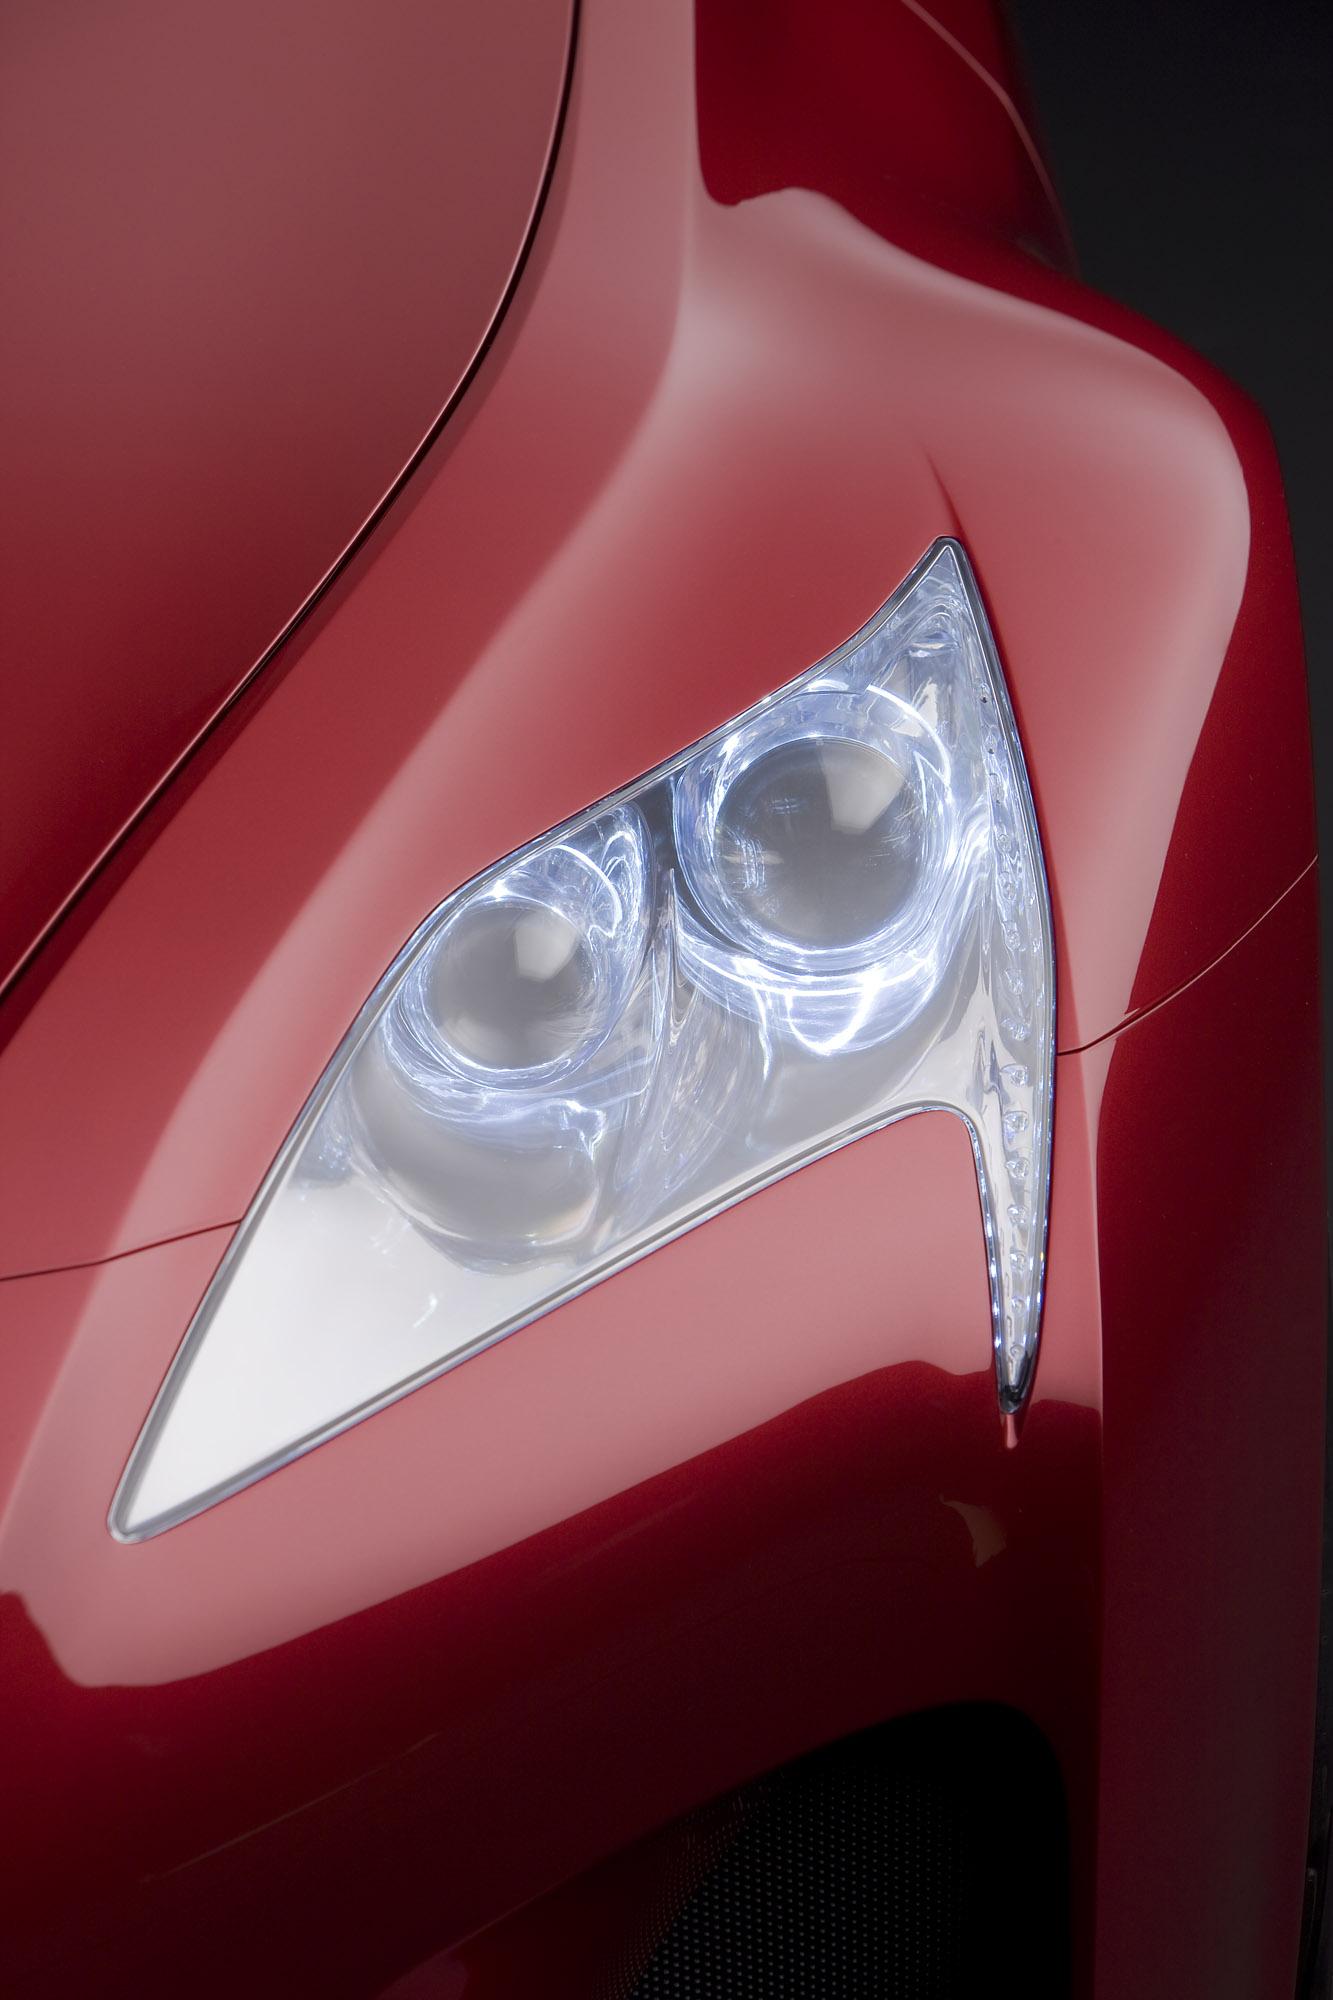 https://www.carsinvasion.com/gallery/2008-lexus-lf-a-roadster-concept/2008-lexus-lf-a-roadster-concept-13.jpg